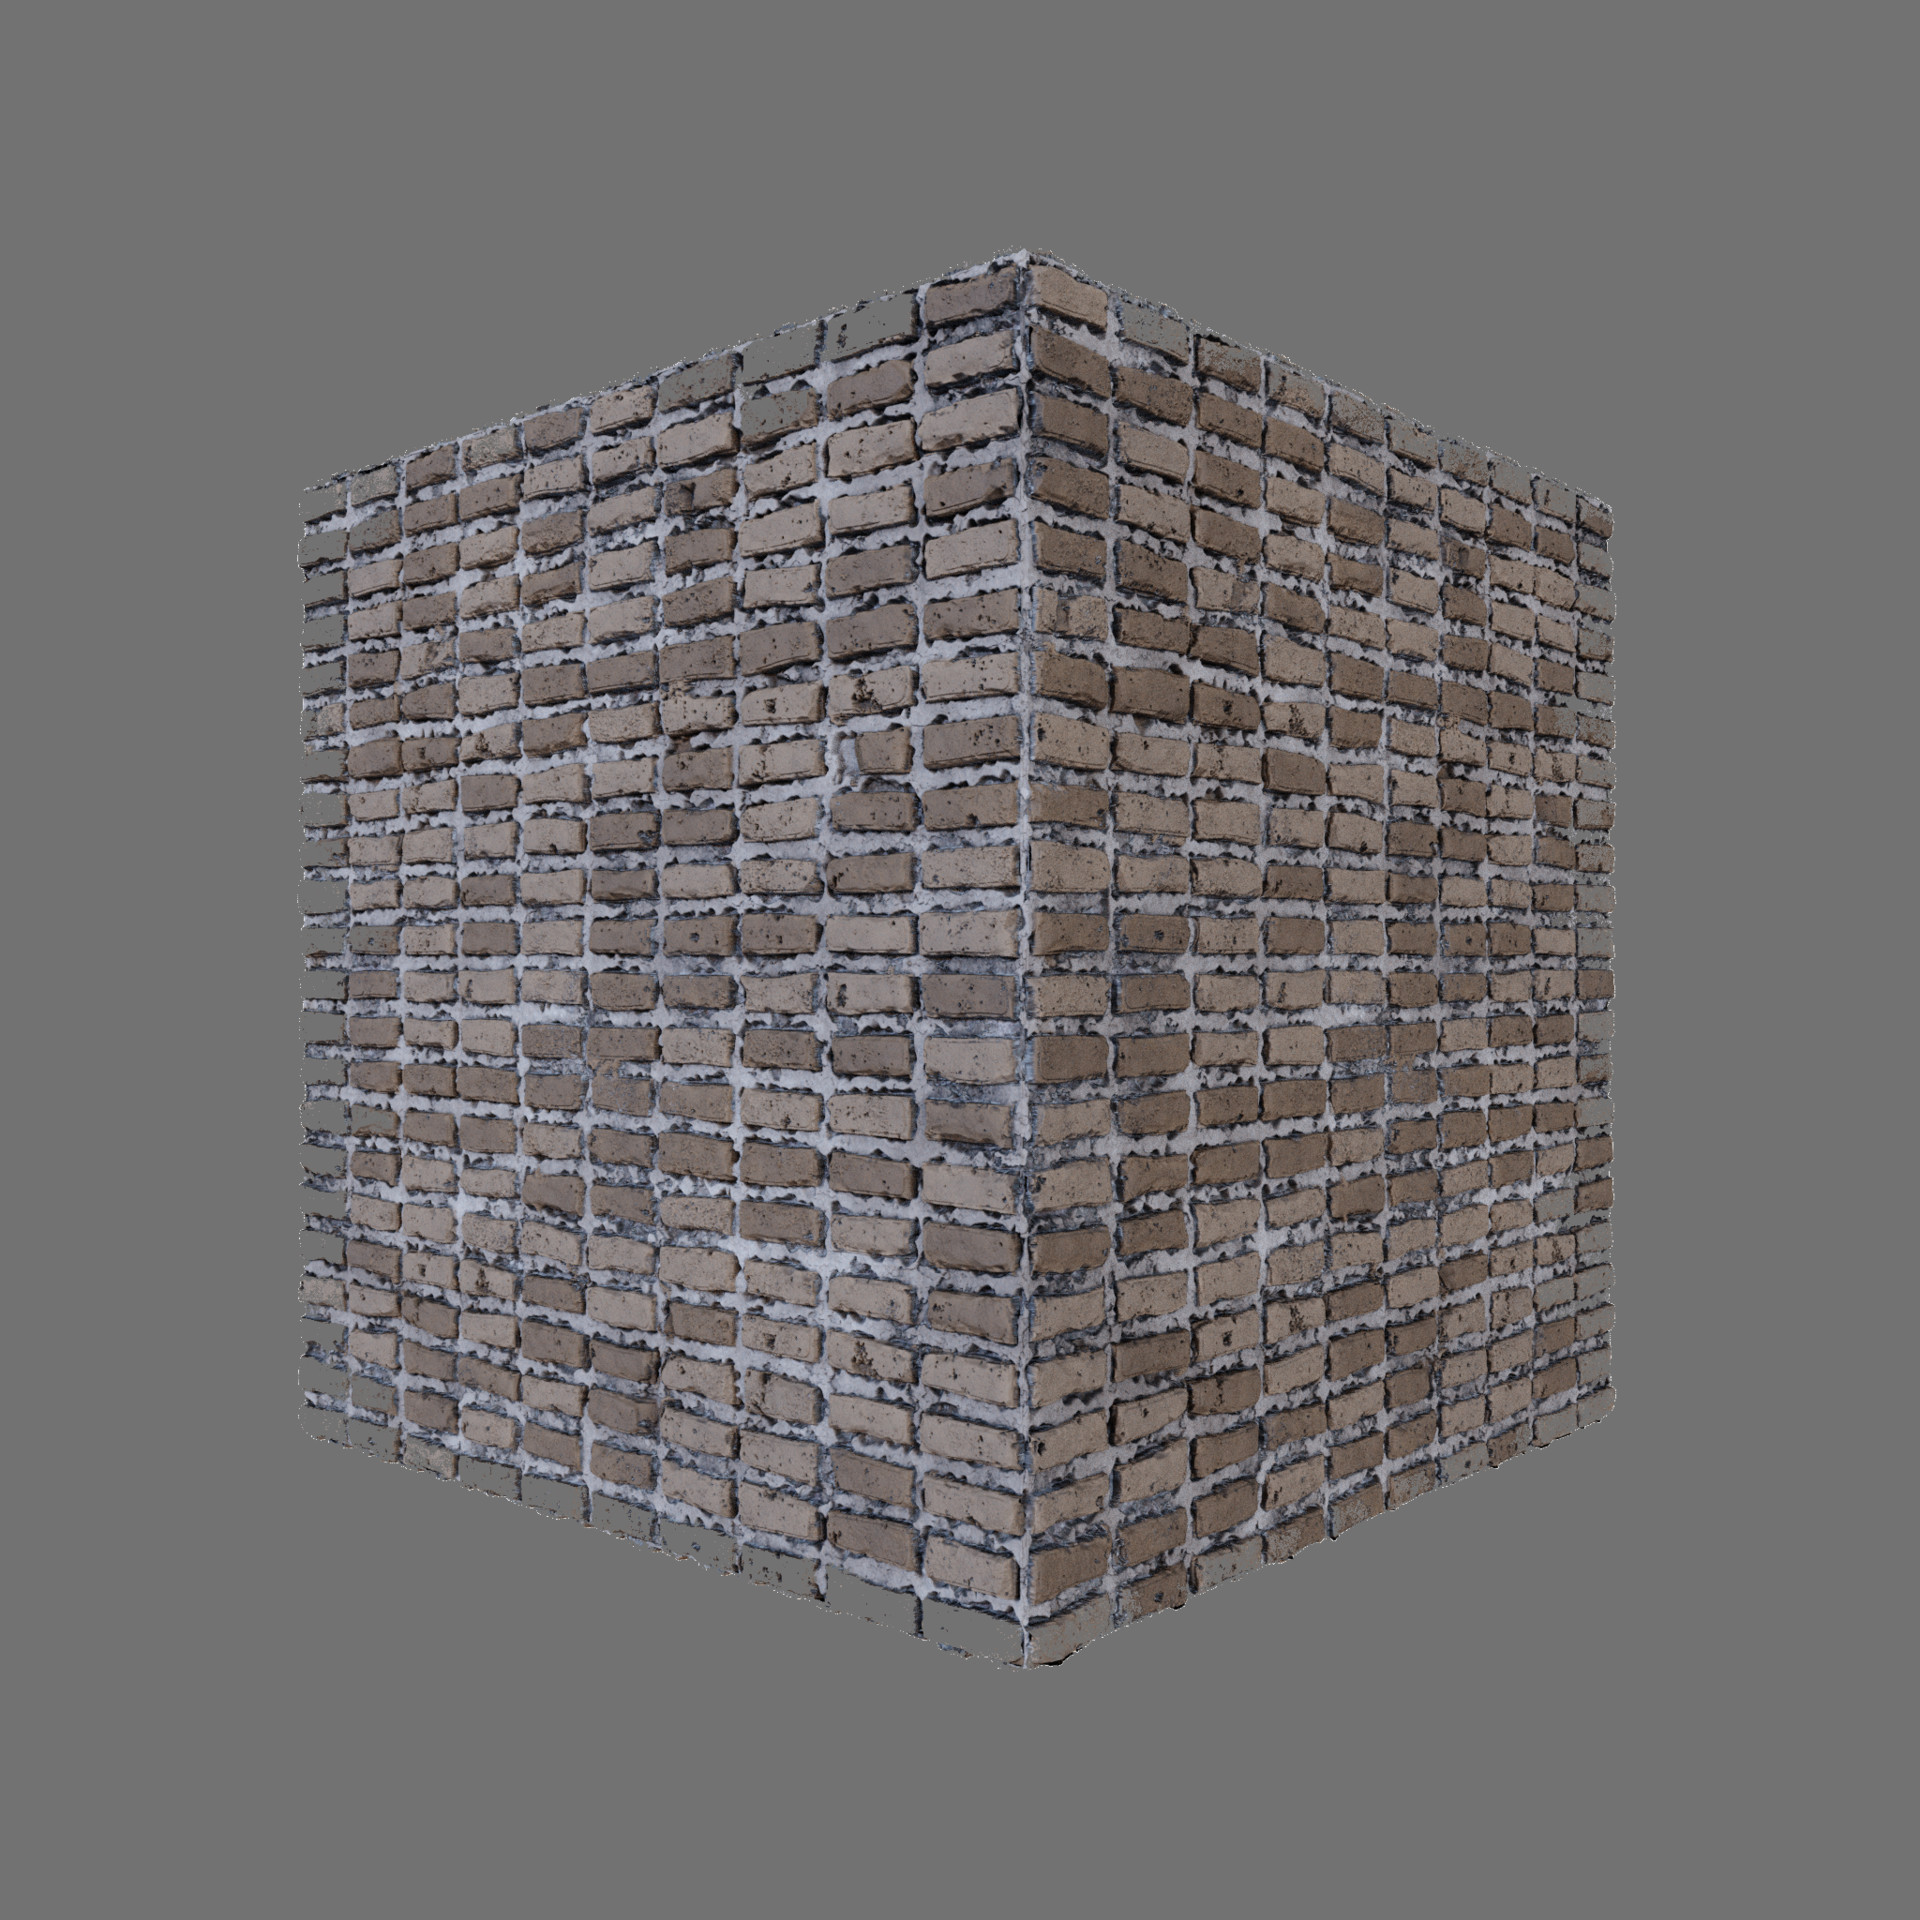 Vinicius hernandes bricks